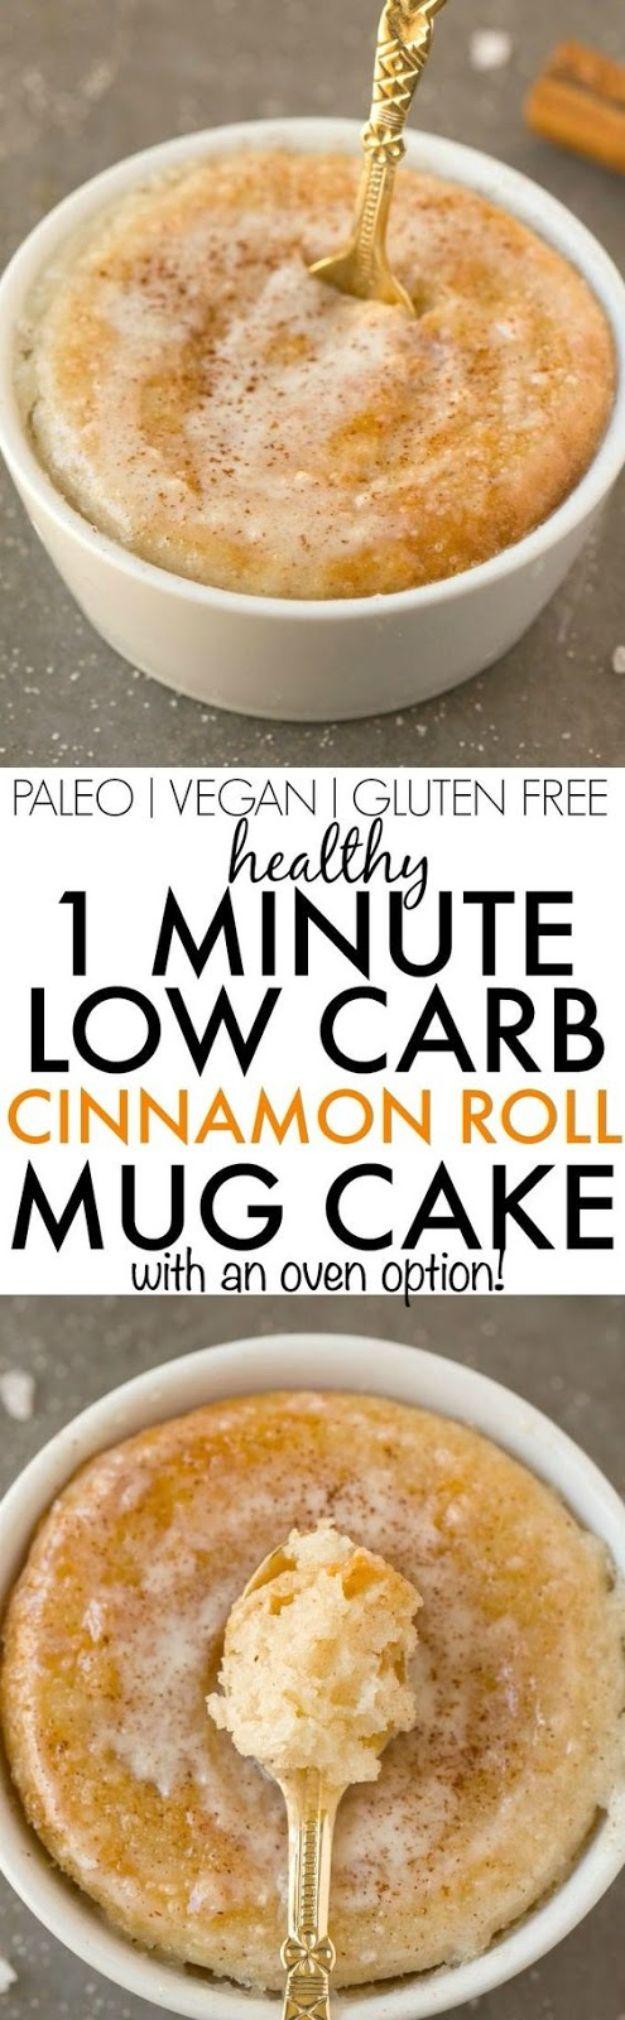 Best Keto Recipes Dessert- 1 Minute Low Carb Cinnamon Roll Mug Cake - Easy Keto Dessert Recipes - How to Make Keto Mug Cake -Quick Desserts for Keto Diet - Gluten Free Dessert Microwave -Low Carb Recipes Pinterest